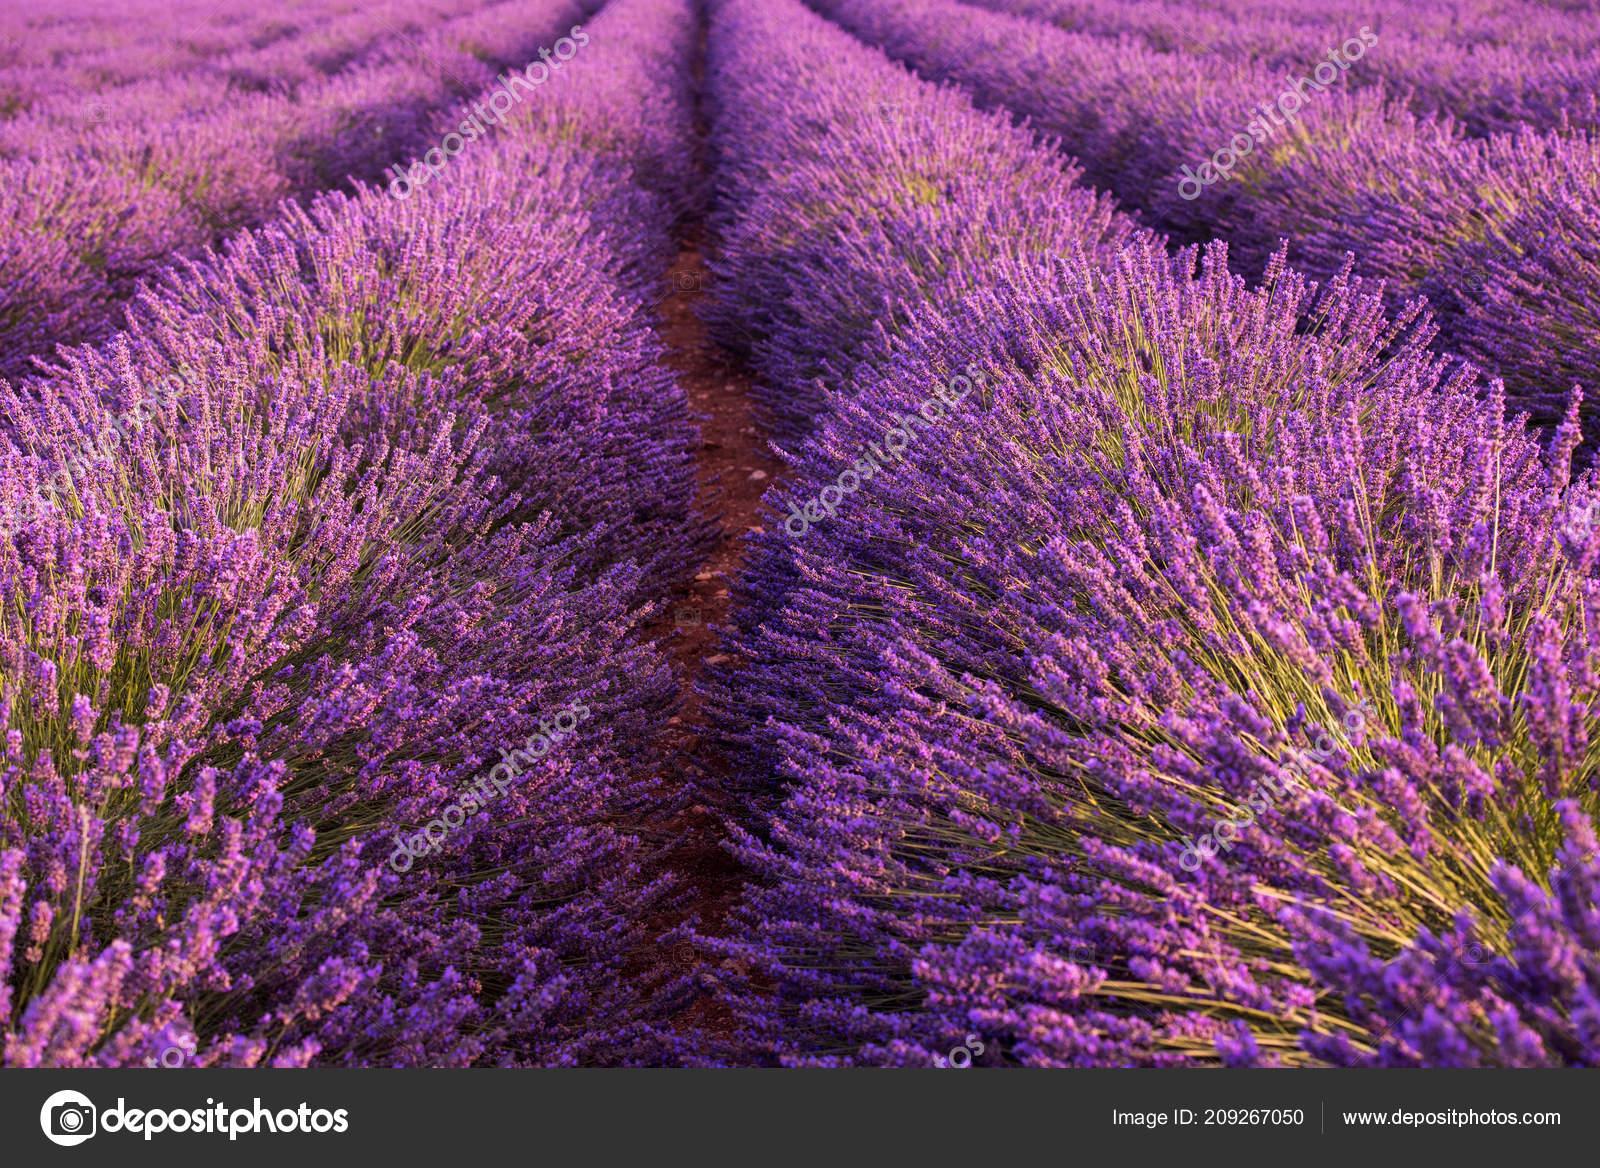 Closeup Purple Lavender Field Blooming Flower Sunlight Flare Bacground Nature Stock Photo C Shock 209267050